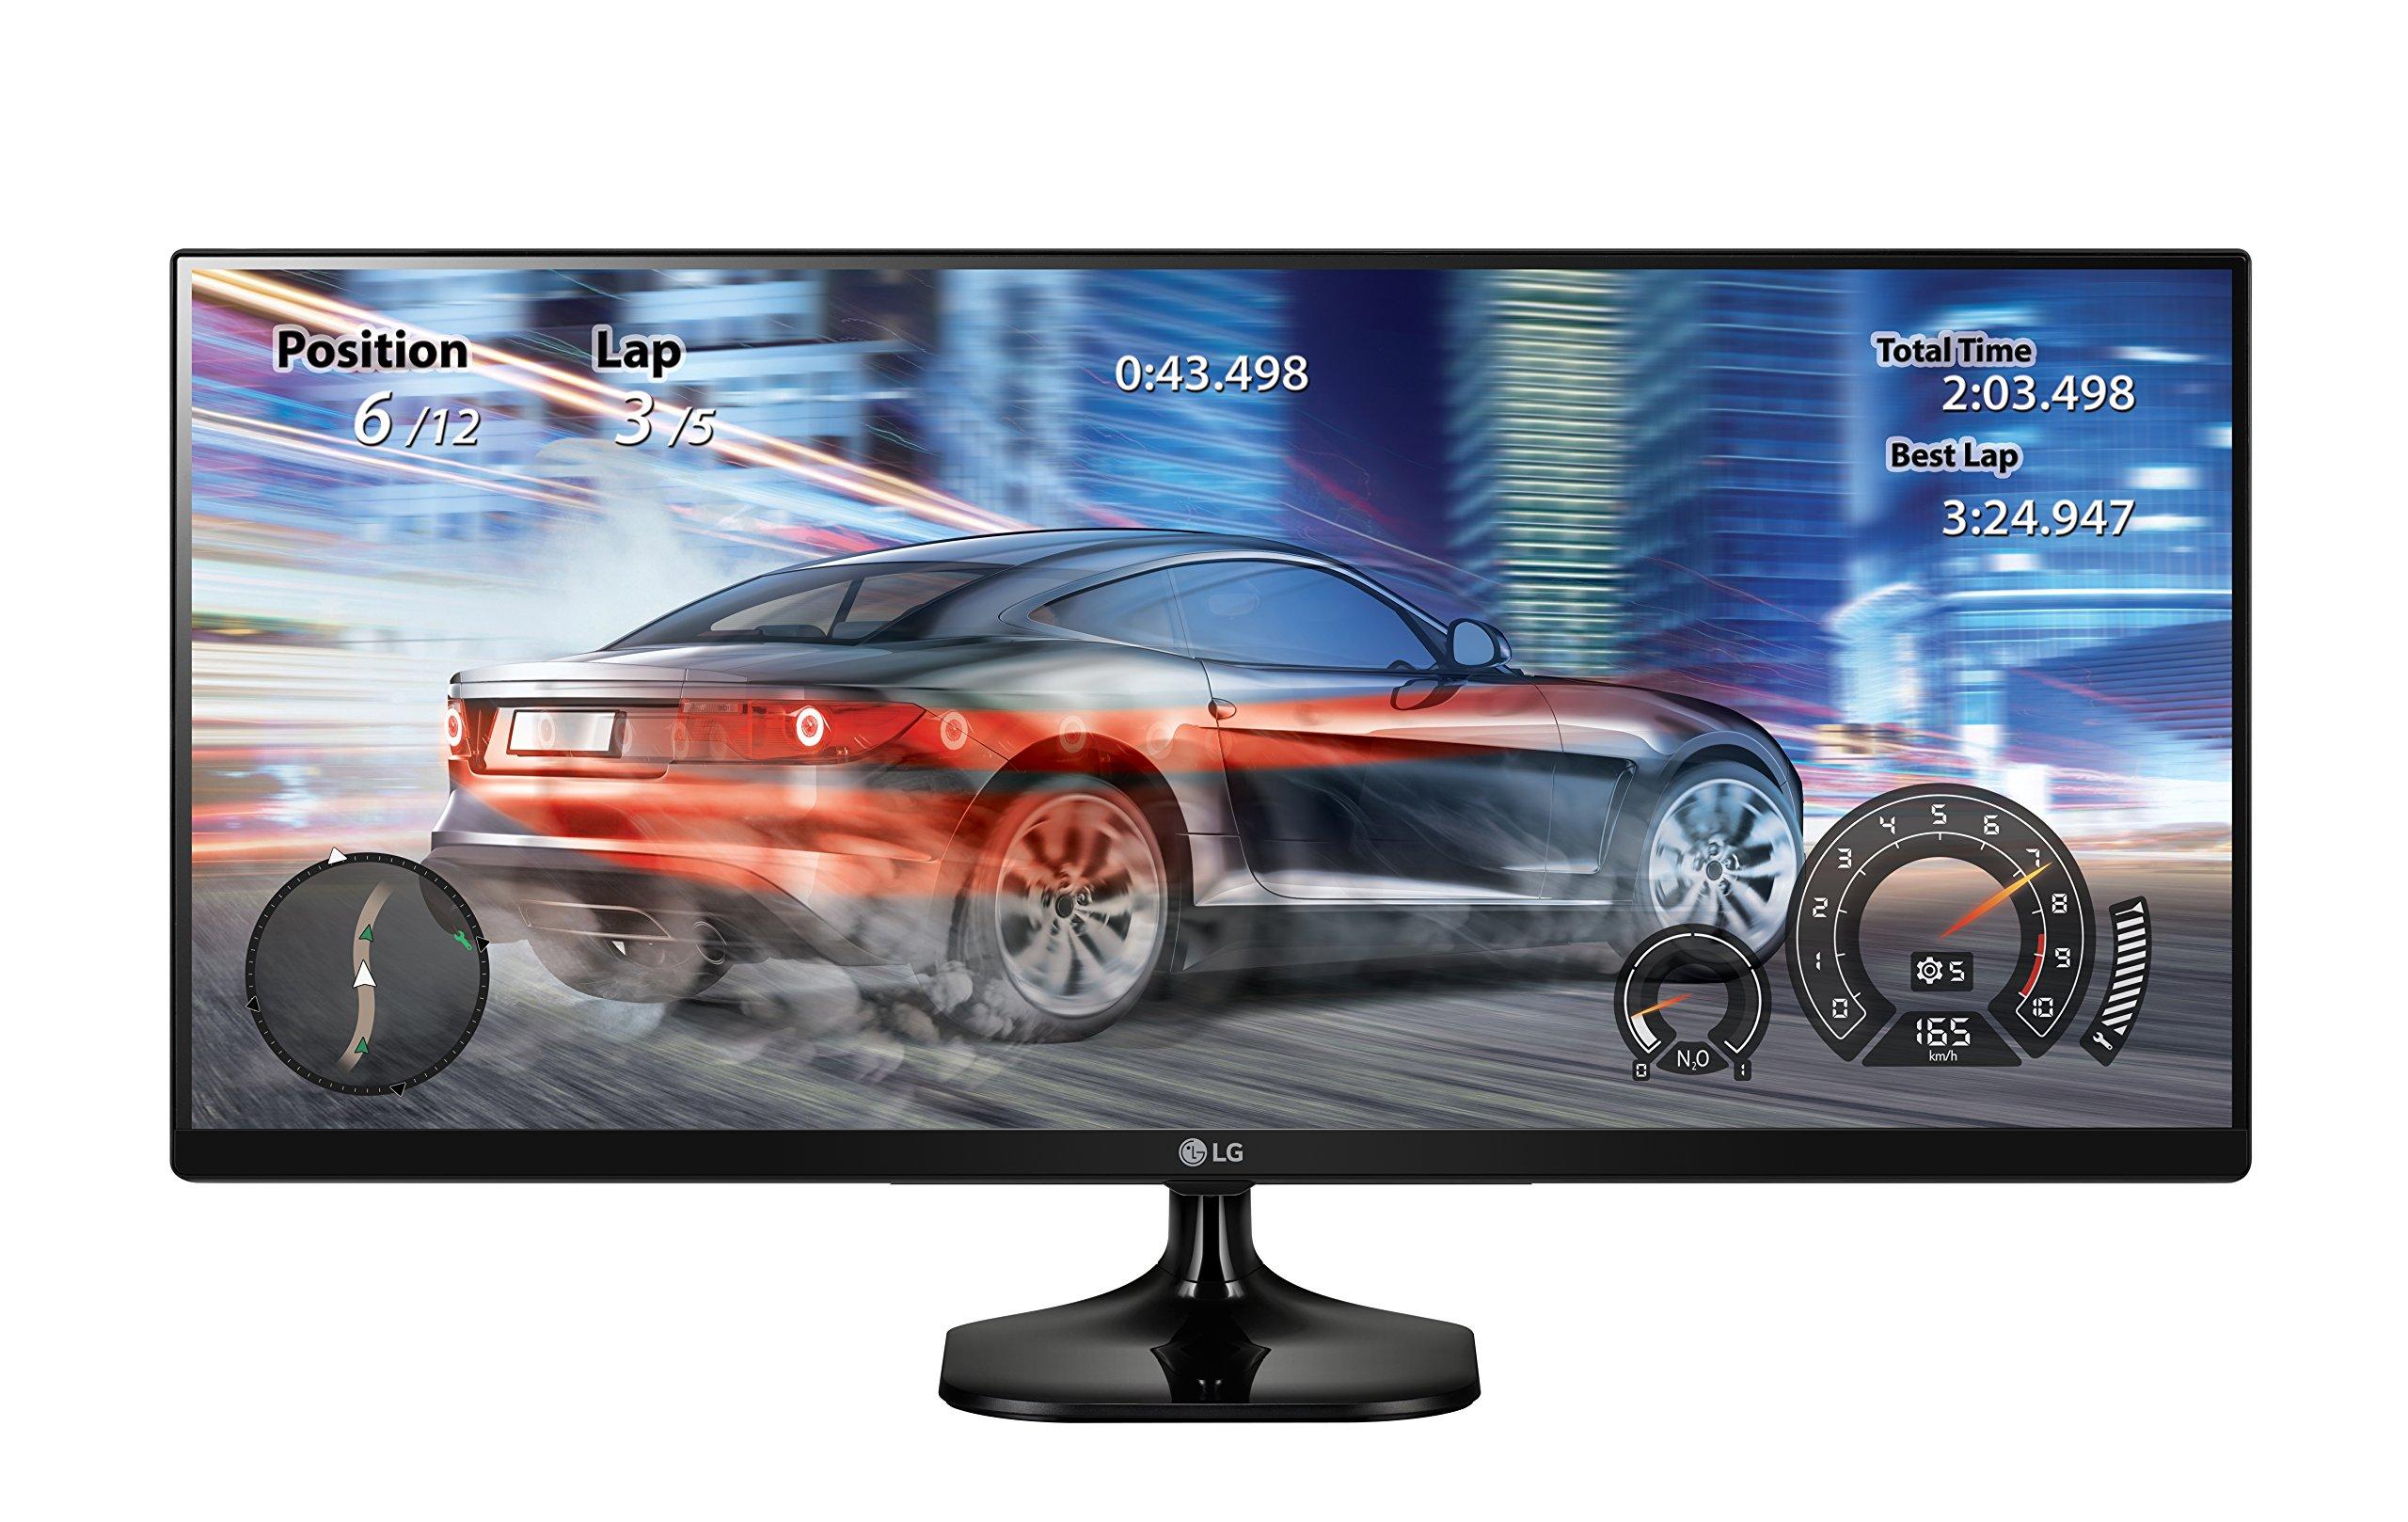 LG 25UM58-P 25-Inch 21:9 UltraWide IPS Monitor with Screen Split